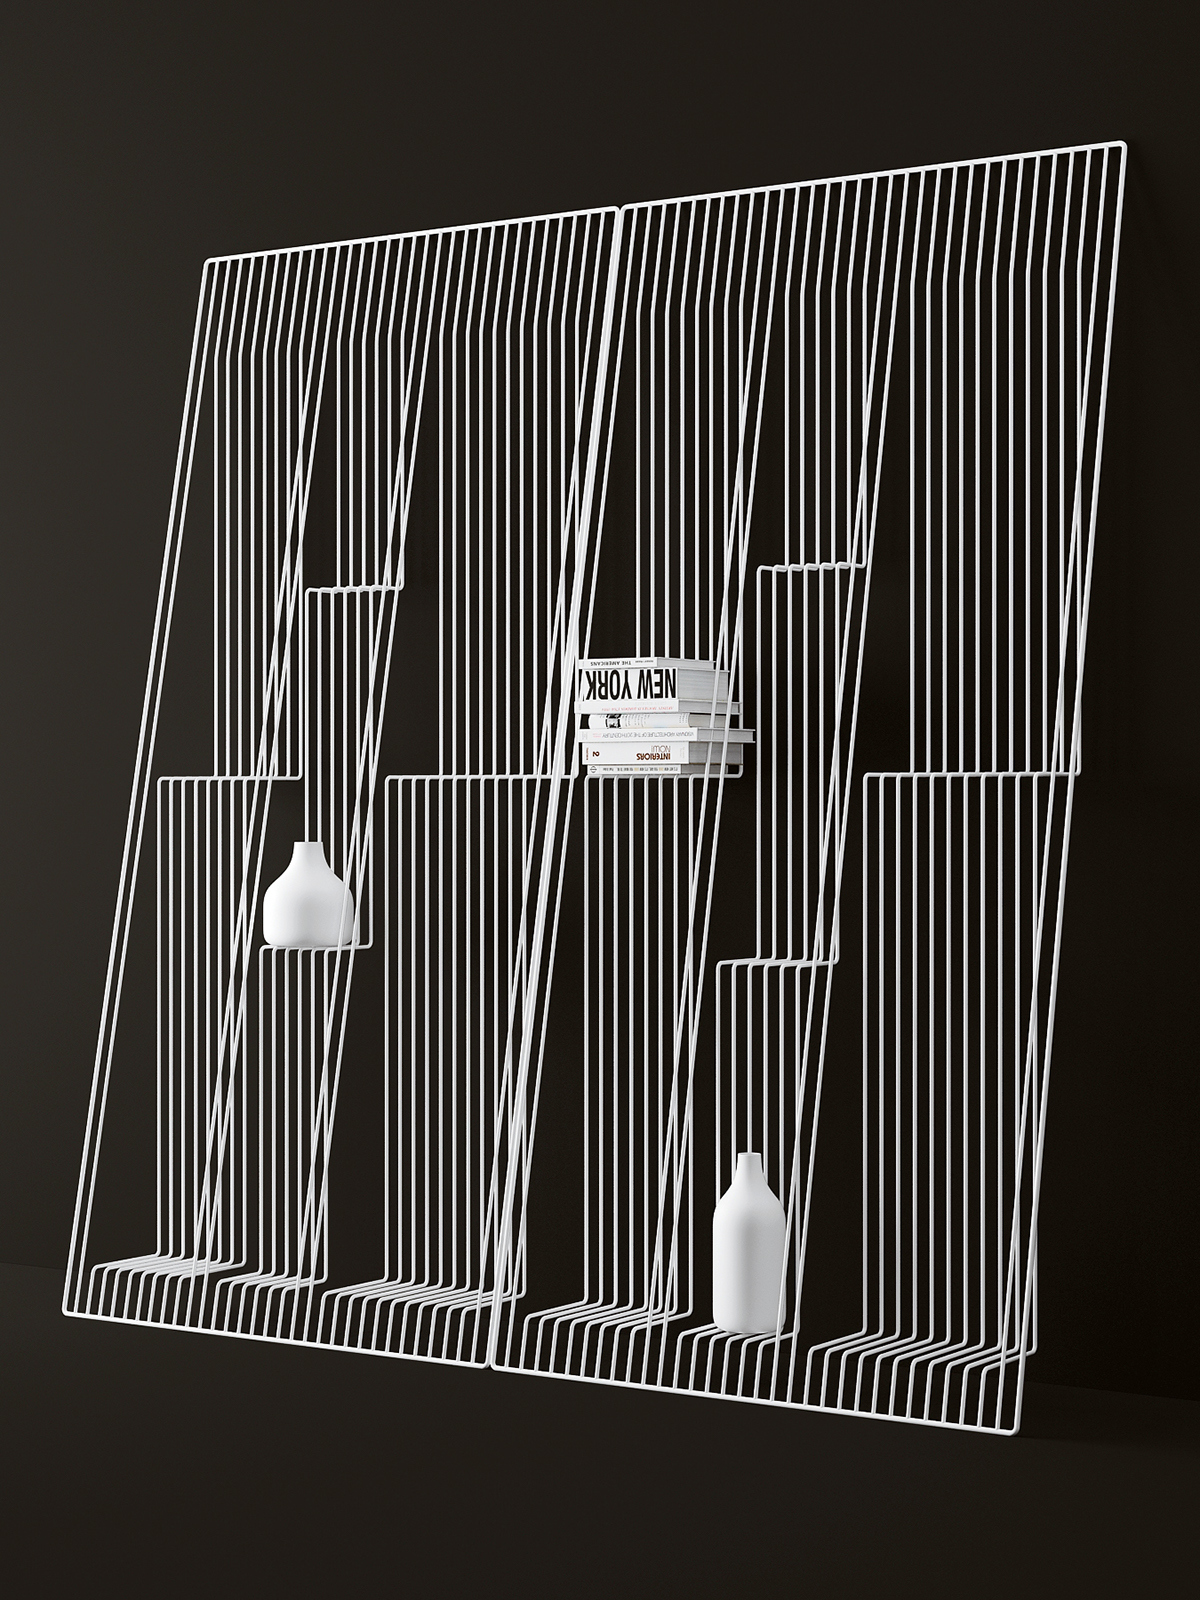 Field Shelving Unit by Dmitry Kozinenko.